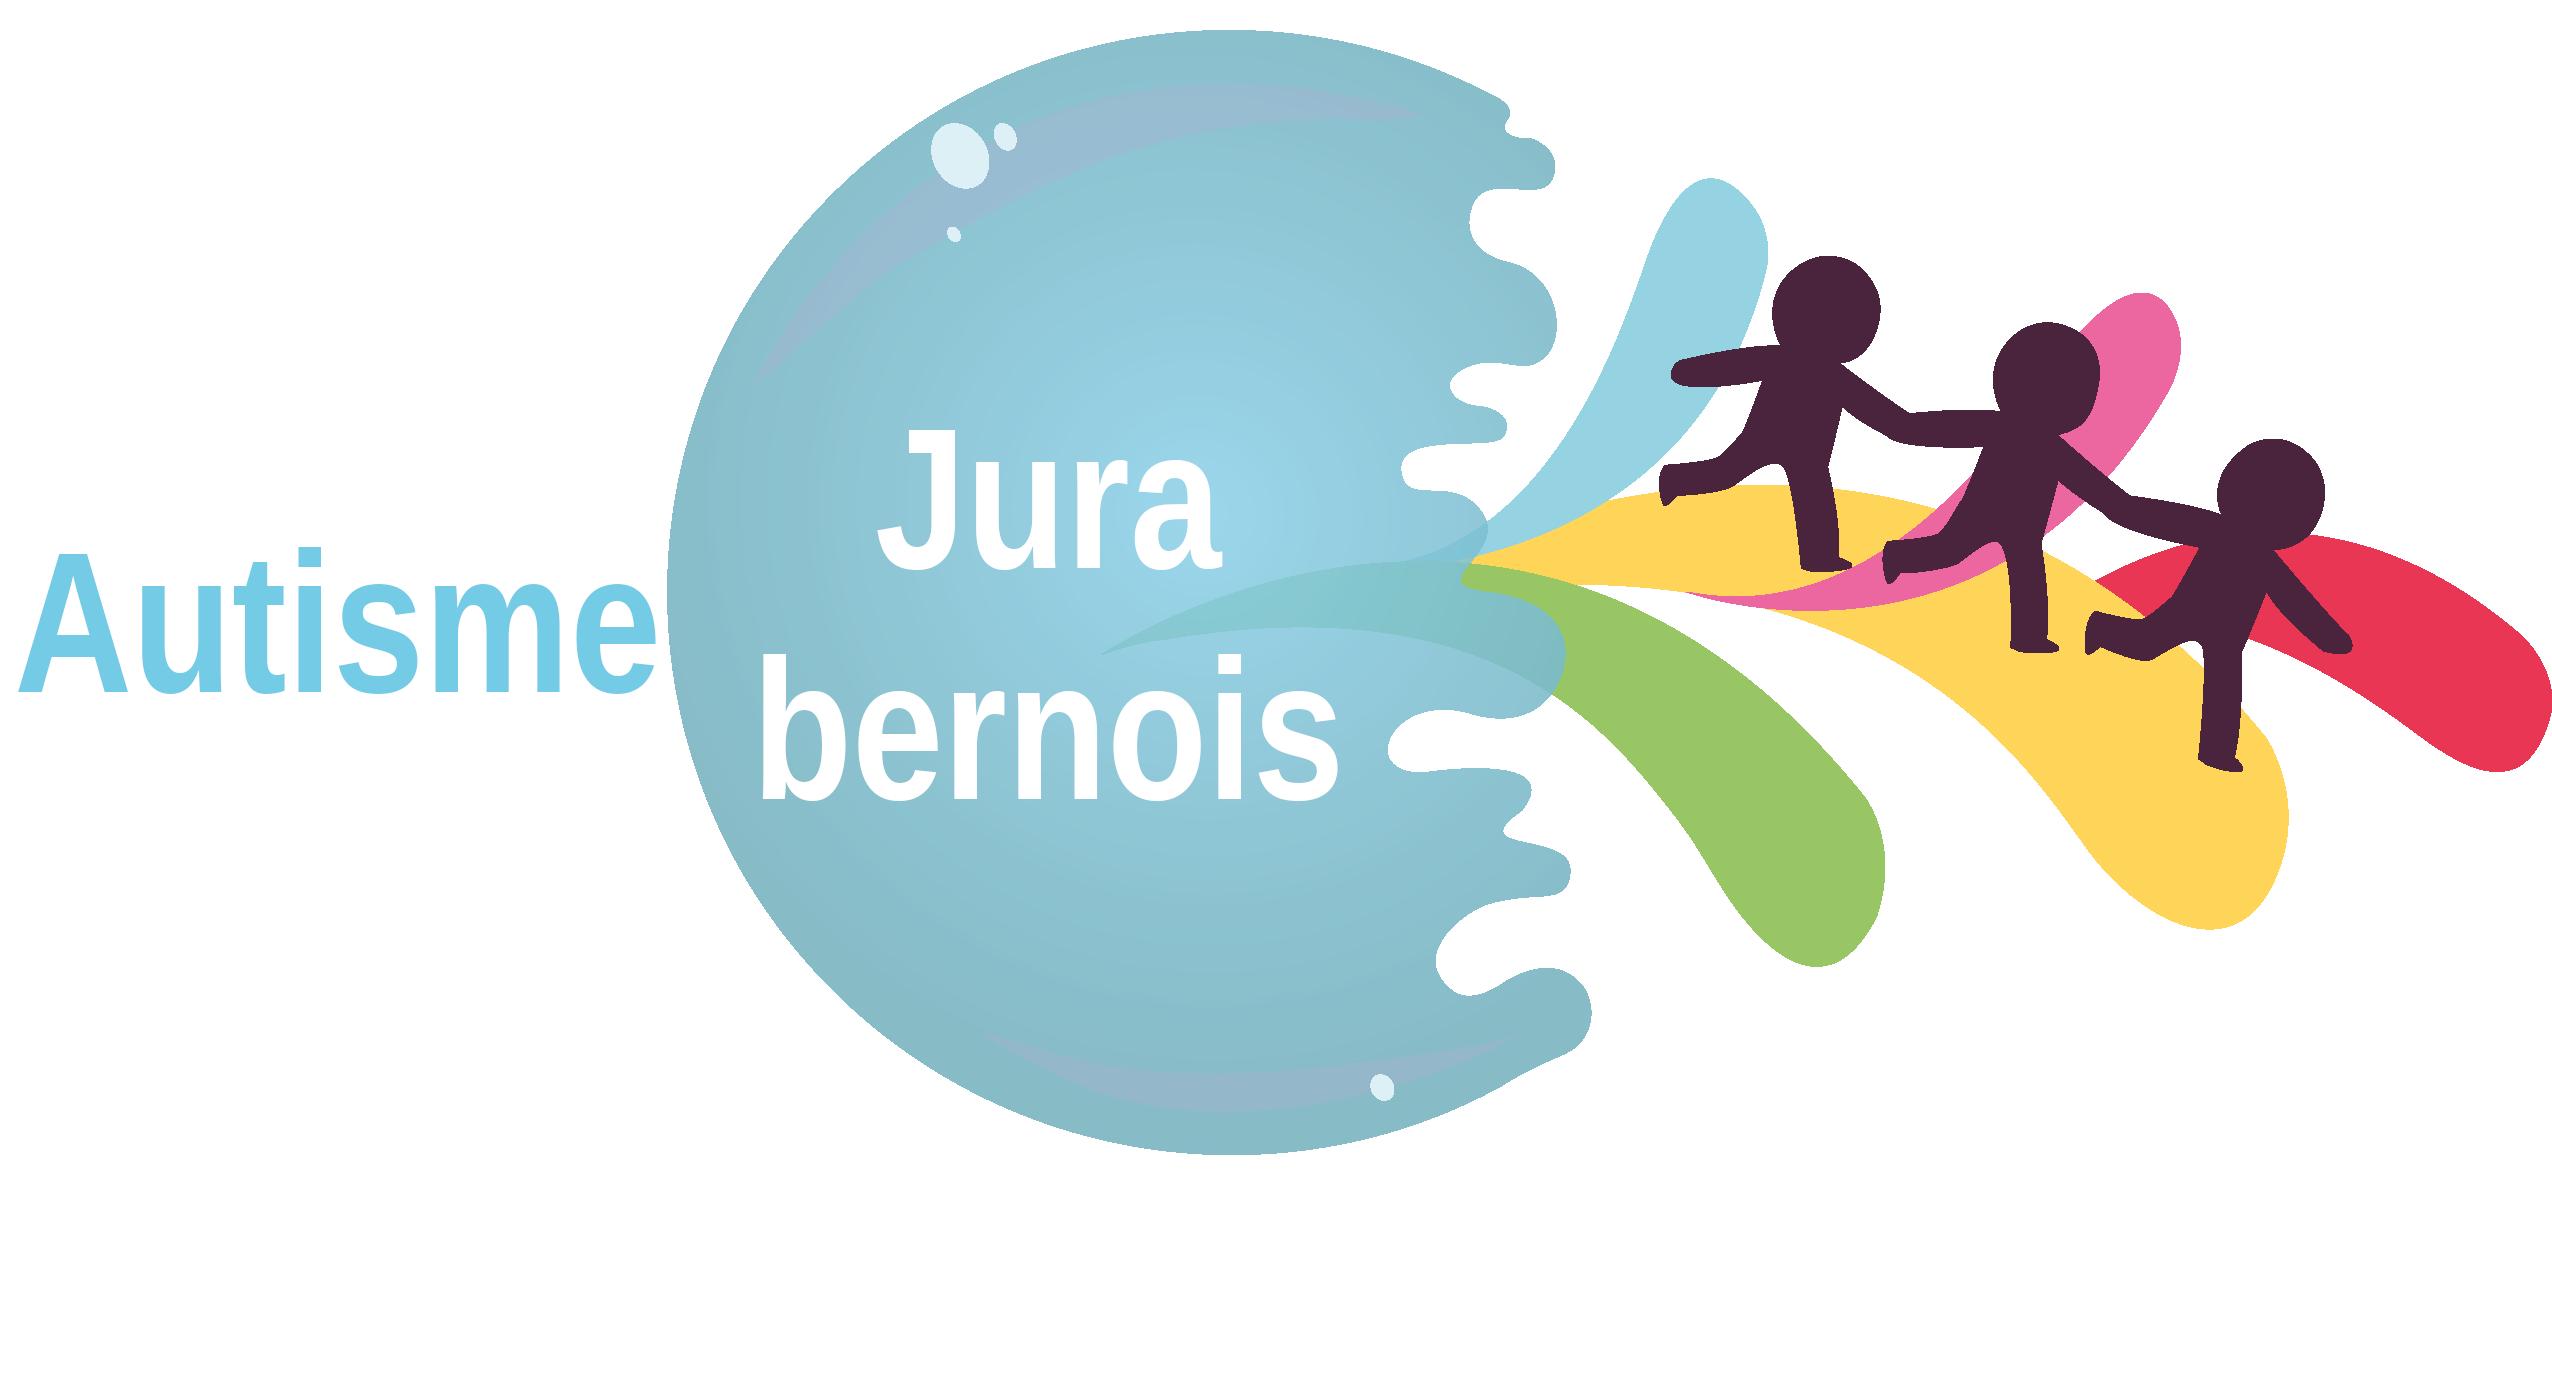 Autisme Jura bernois